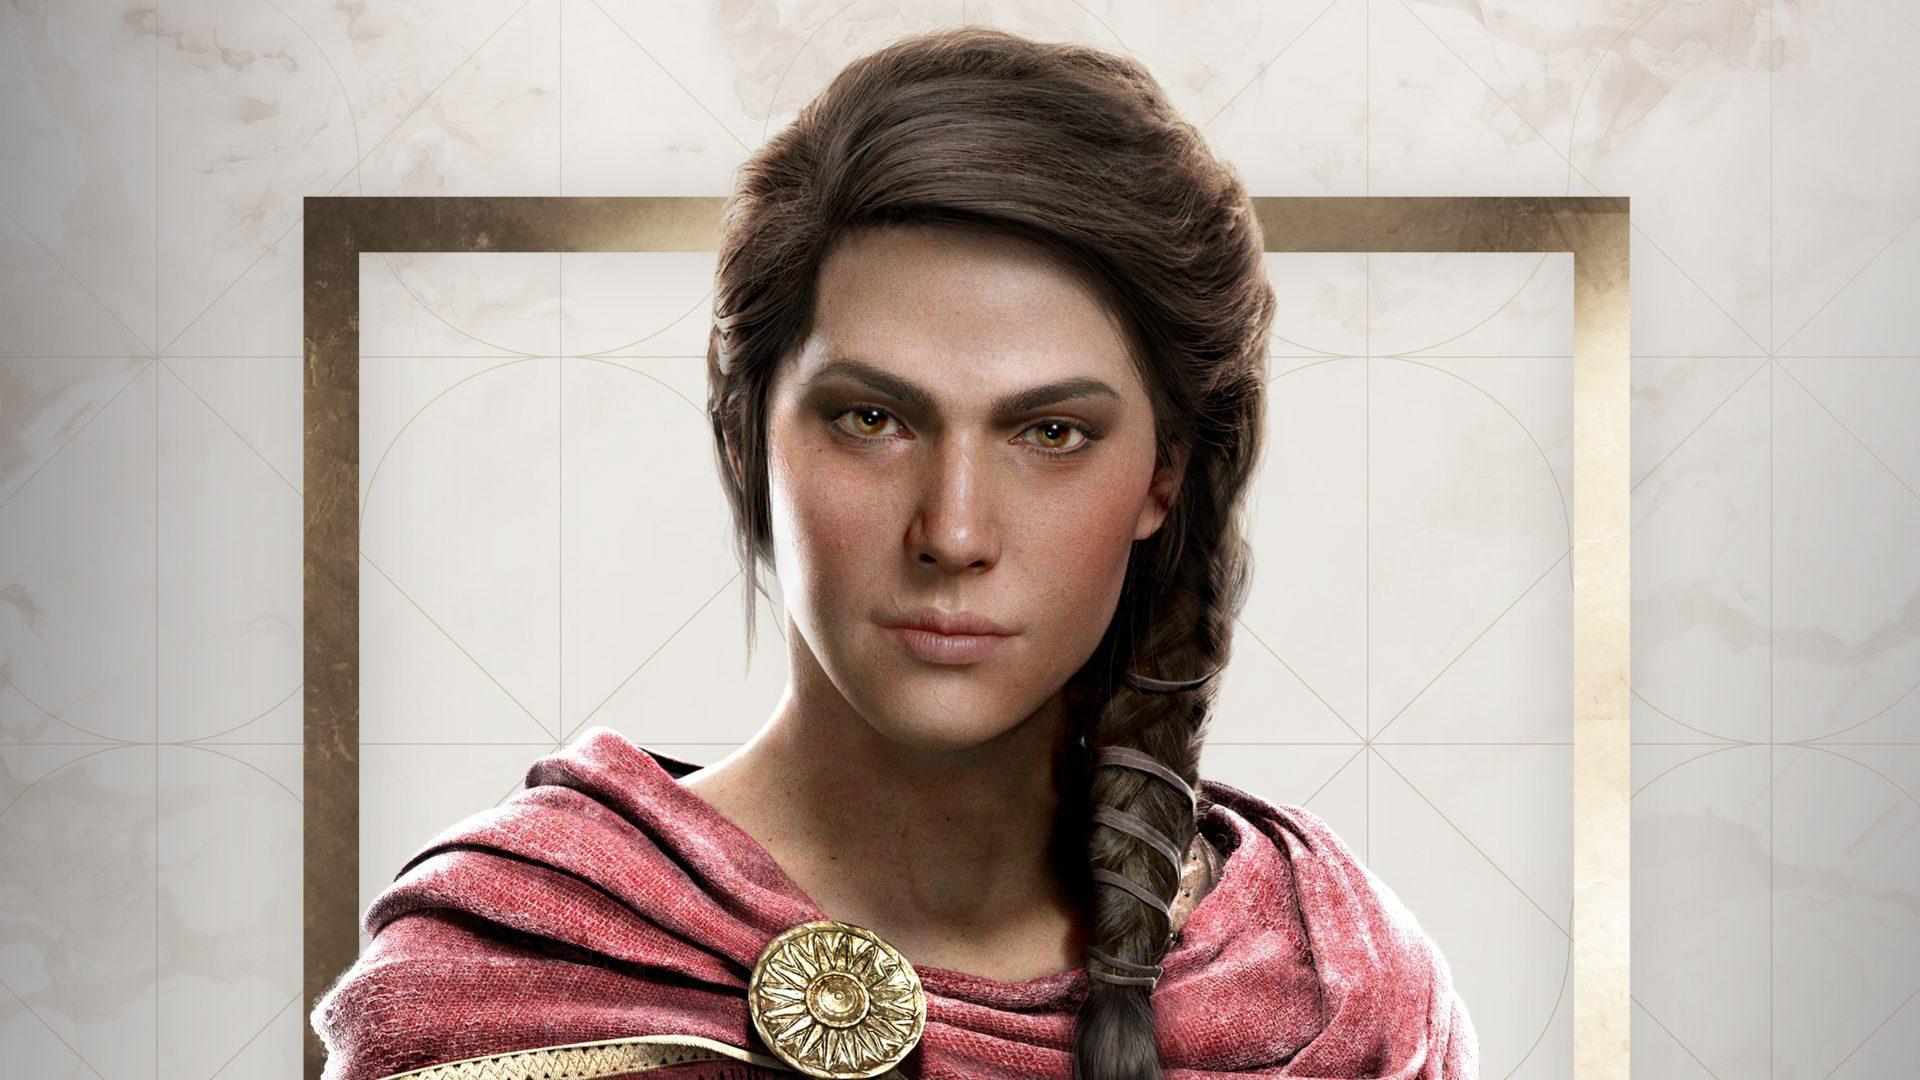 Assassin's Creed Odyssey Kassandra